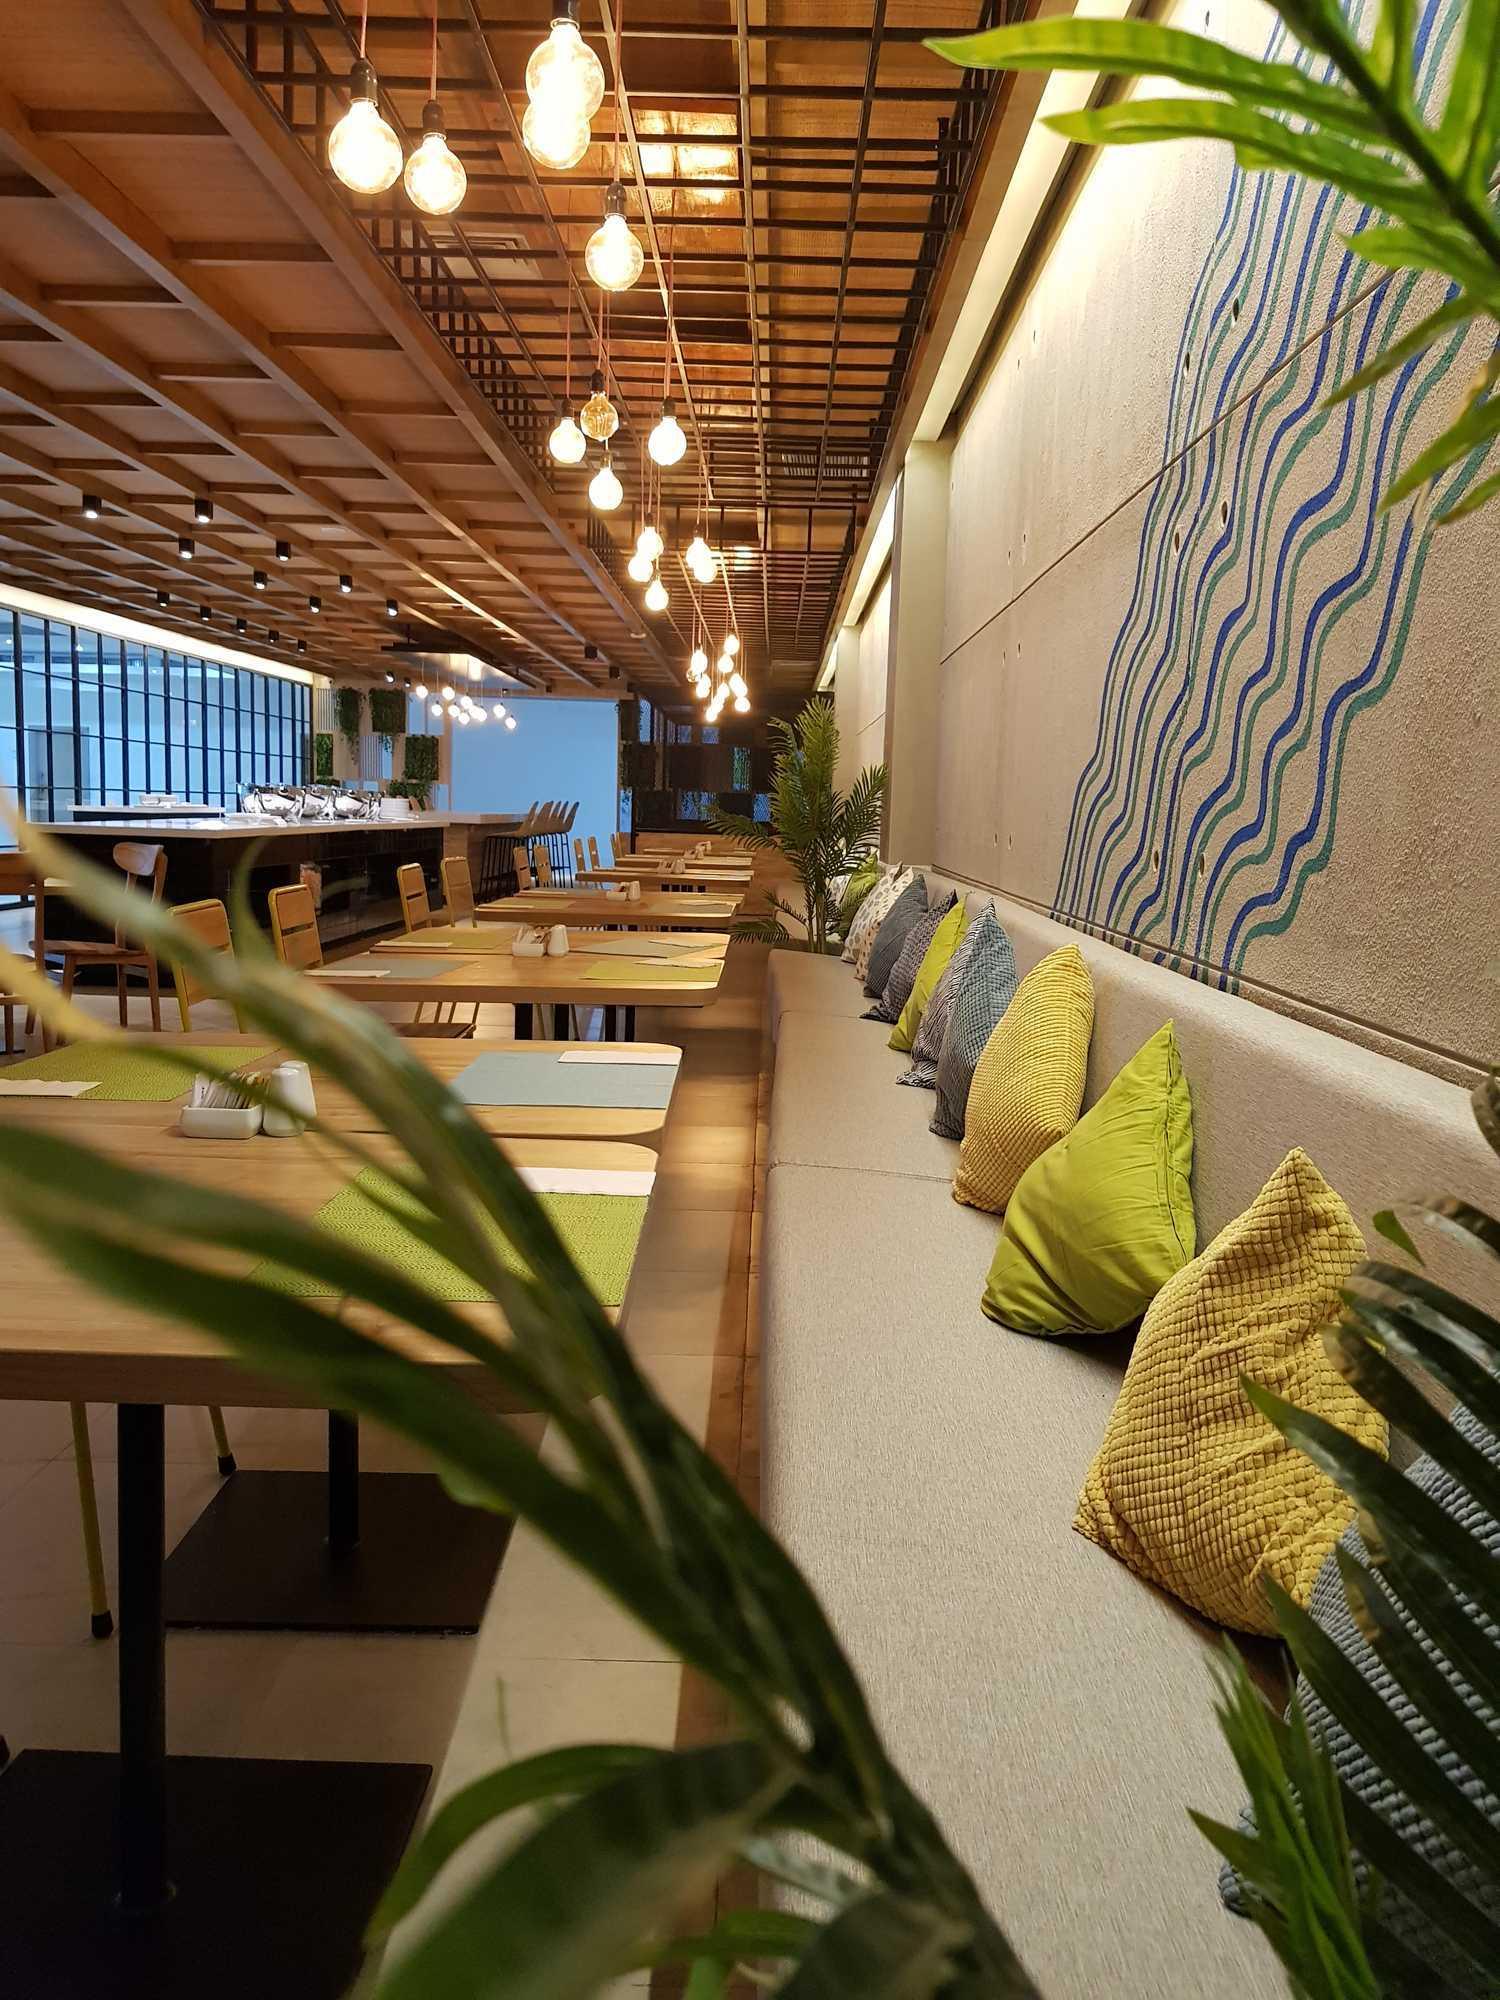 Ruang Komunal Kemiri Restaurant Surabaya, Kota Sby, Jawa Timur, Indonesia Surabaya, Kota Sby, Jawa Timur, Indonesia Ruang-Komunal-Kemiri-House  61179